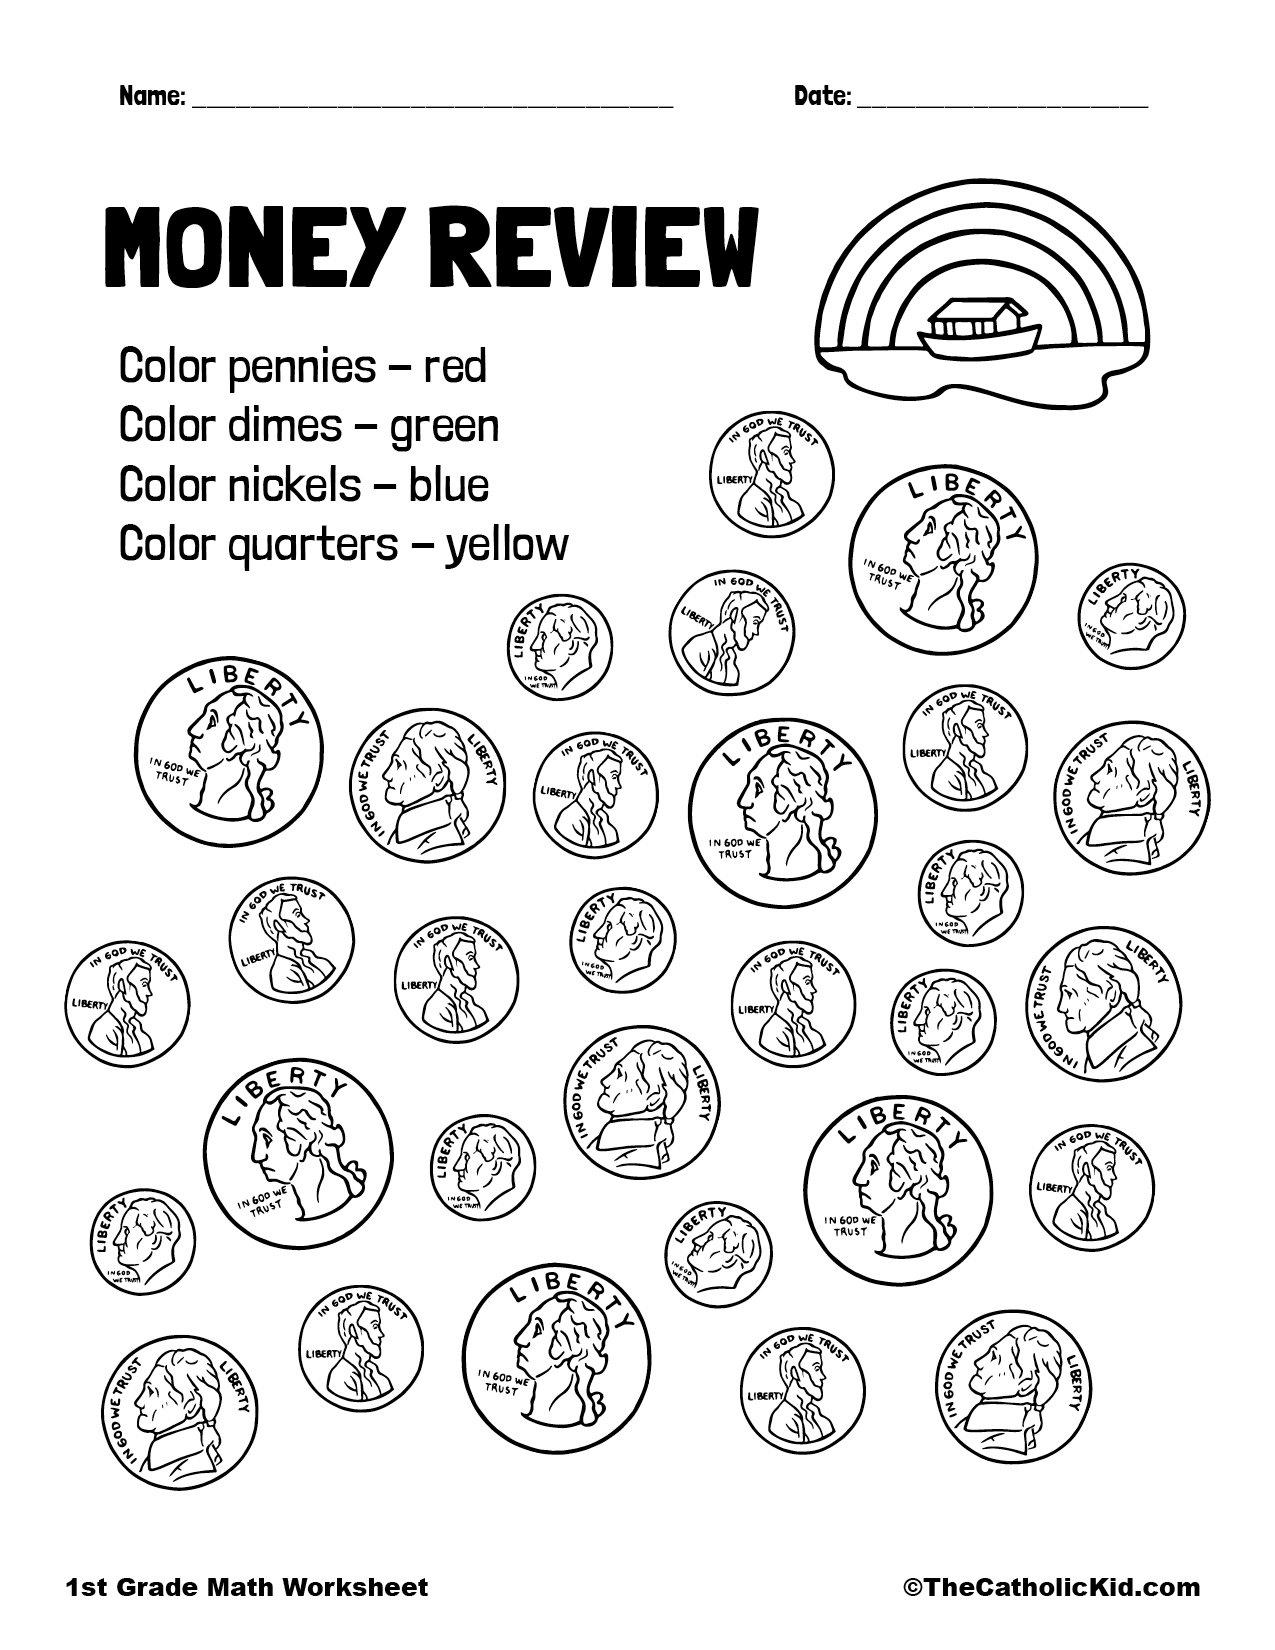 1st Grade Math Catholic Themed Worksheet Money Review